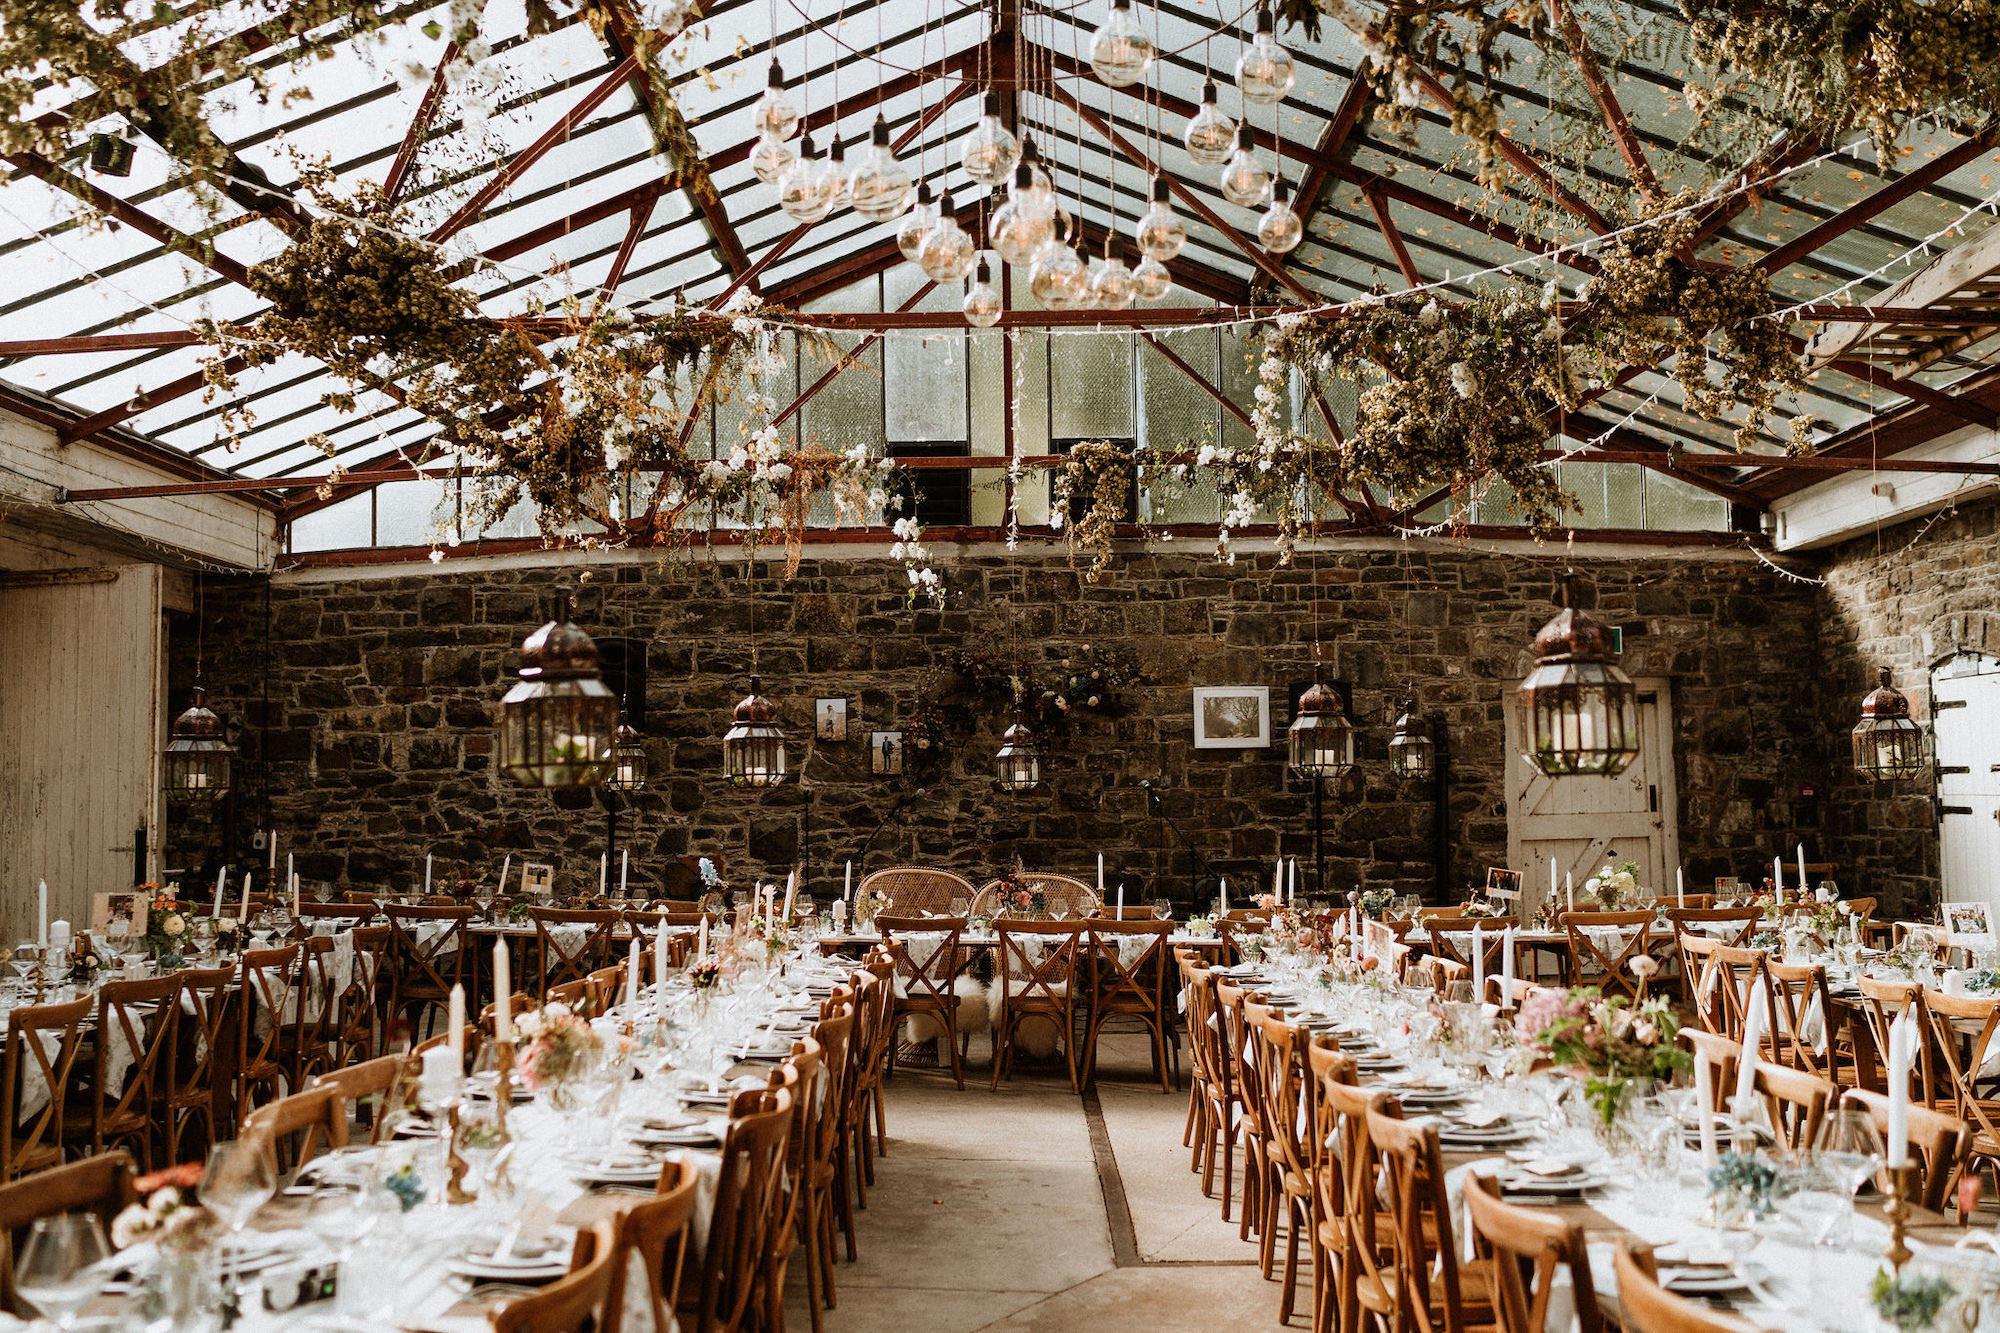 Plas Dinam Country House - Wales Wedding Venue